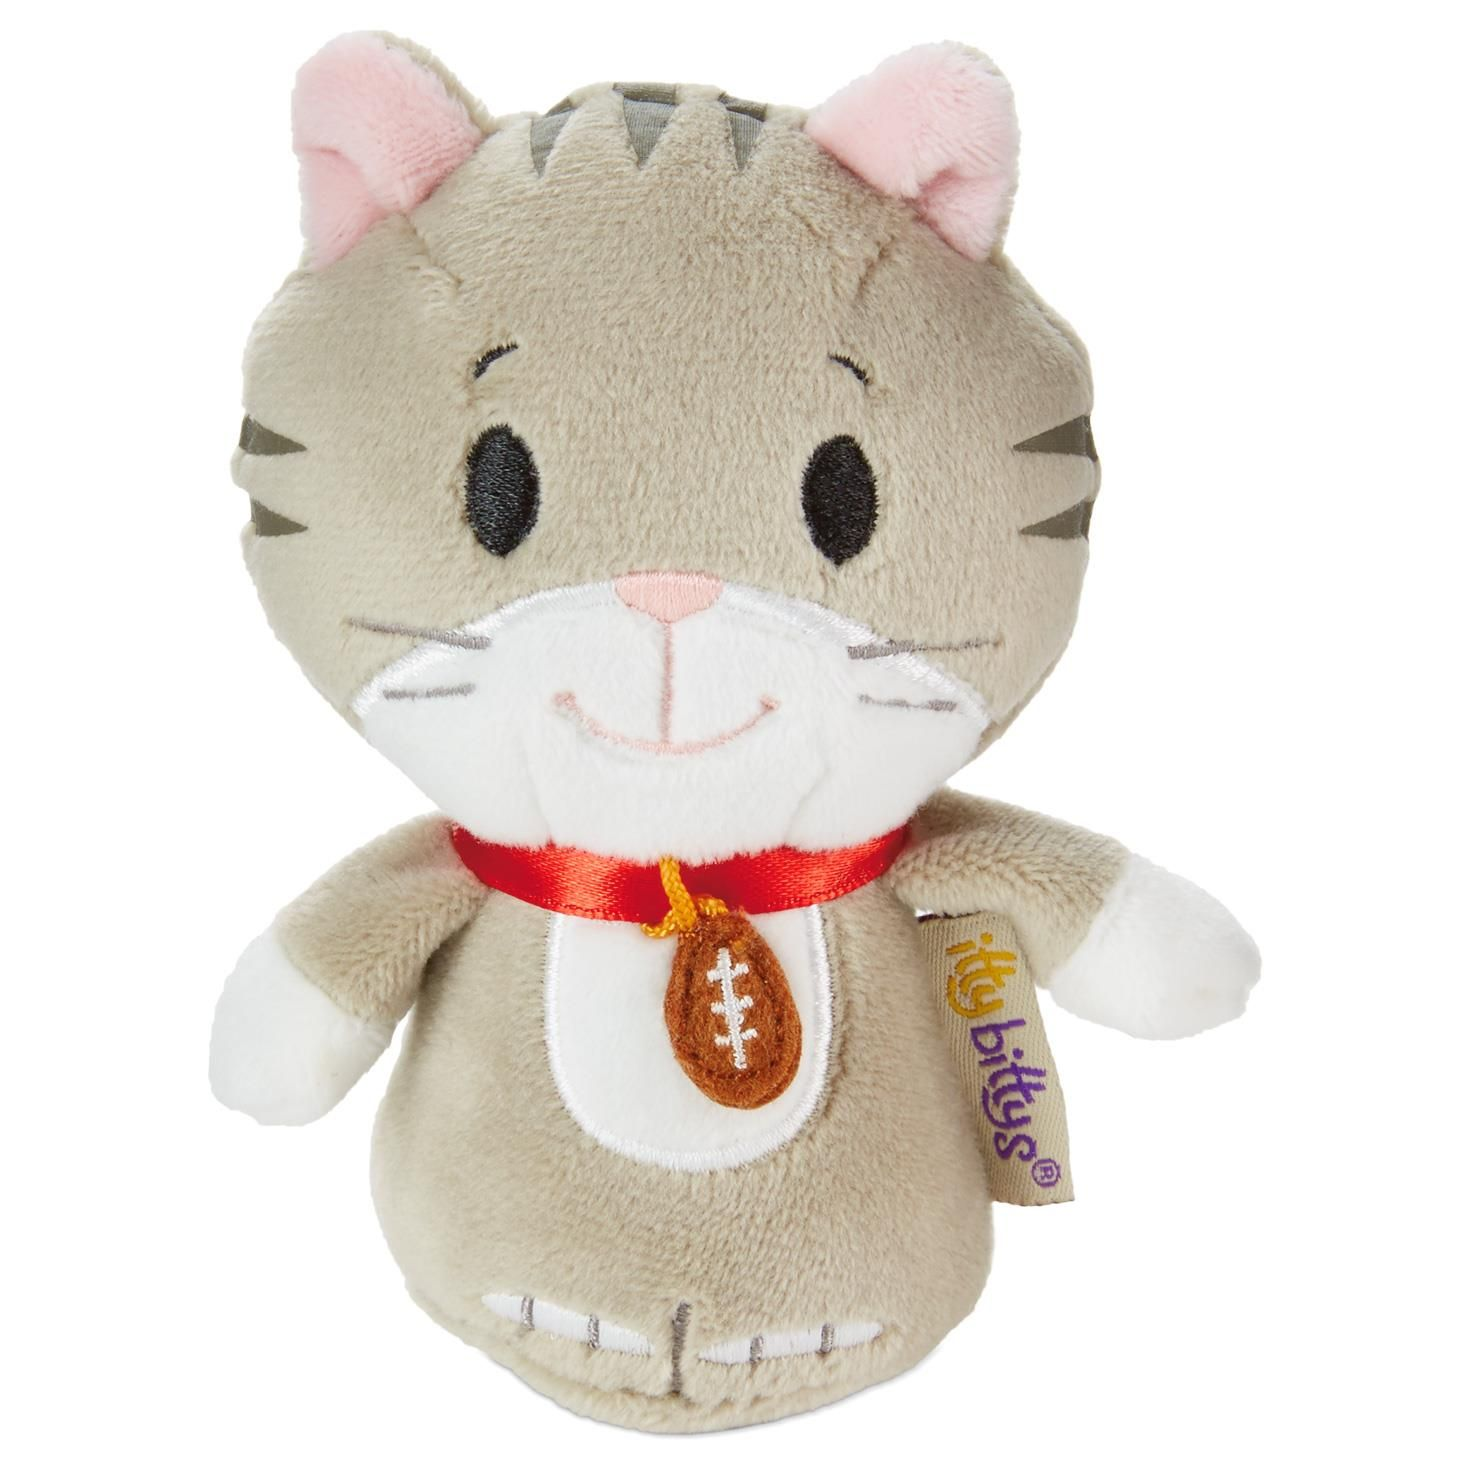 Itty Bittys Kitten Bowl Lucky Stuffed Animal Large With Images Kitten Bowls Itty Bitty Itty